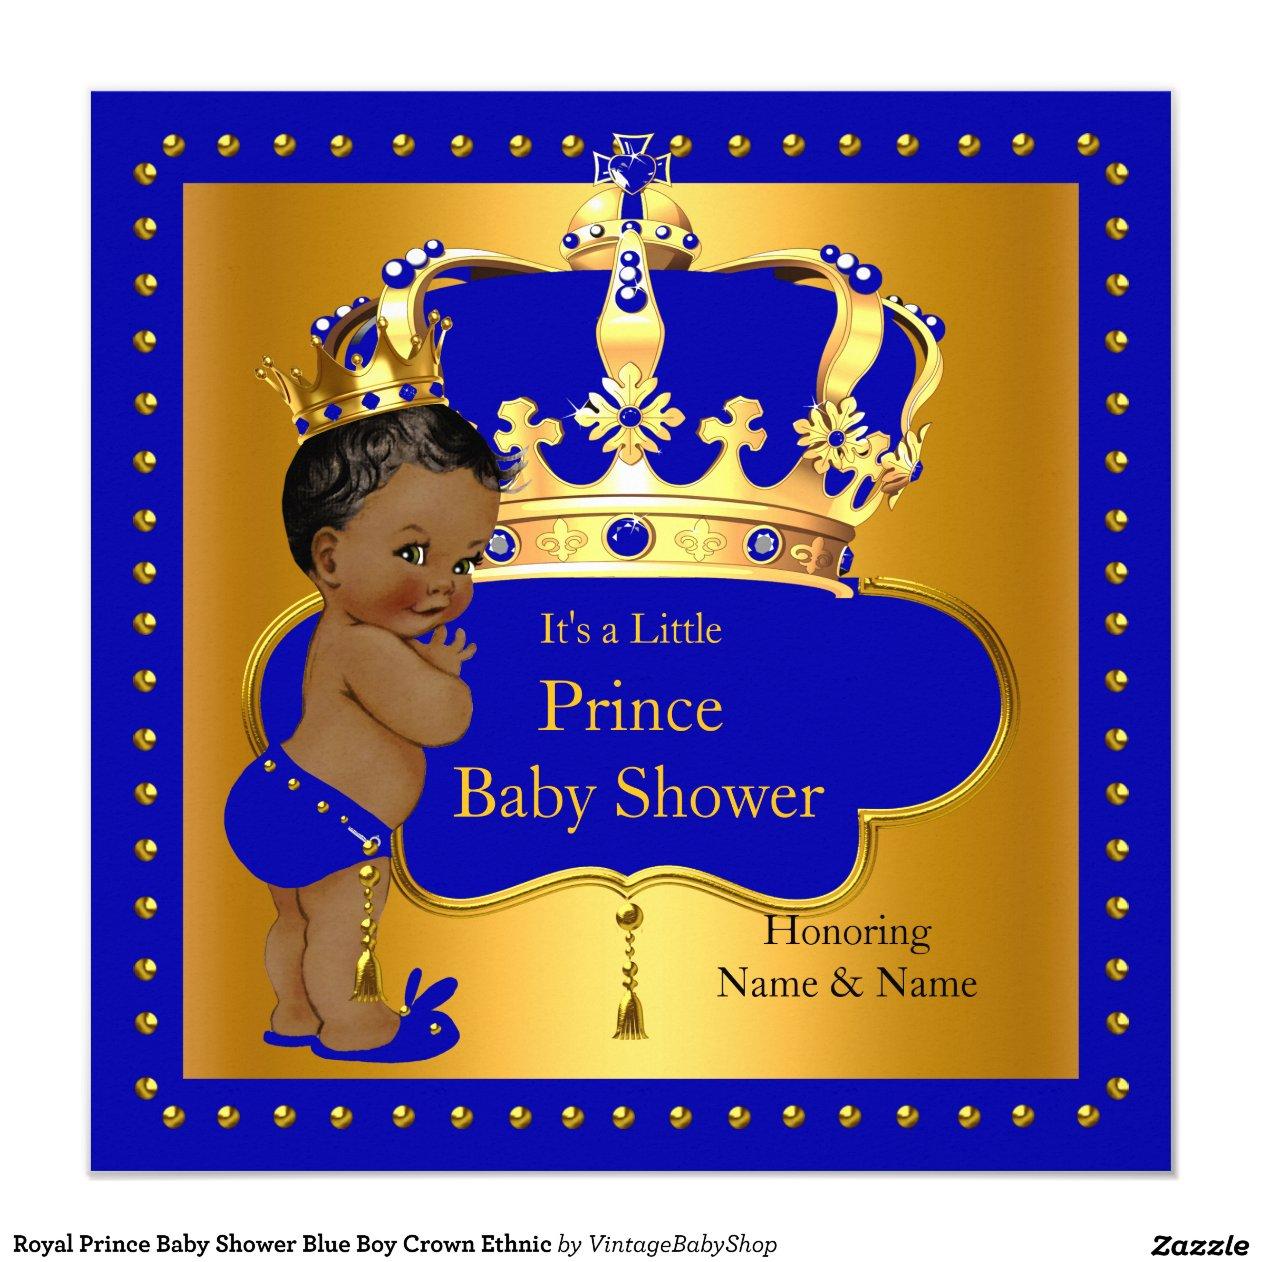 royal_prince_baby_shower_blue_boy_crown_ethnic_invitation ...